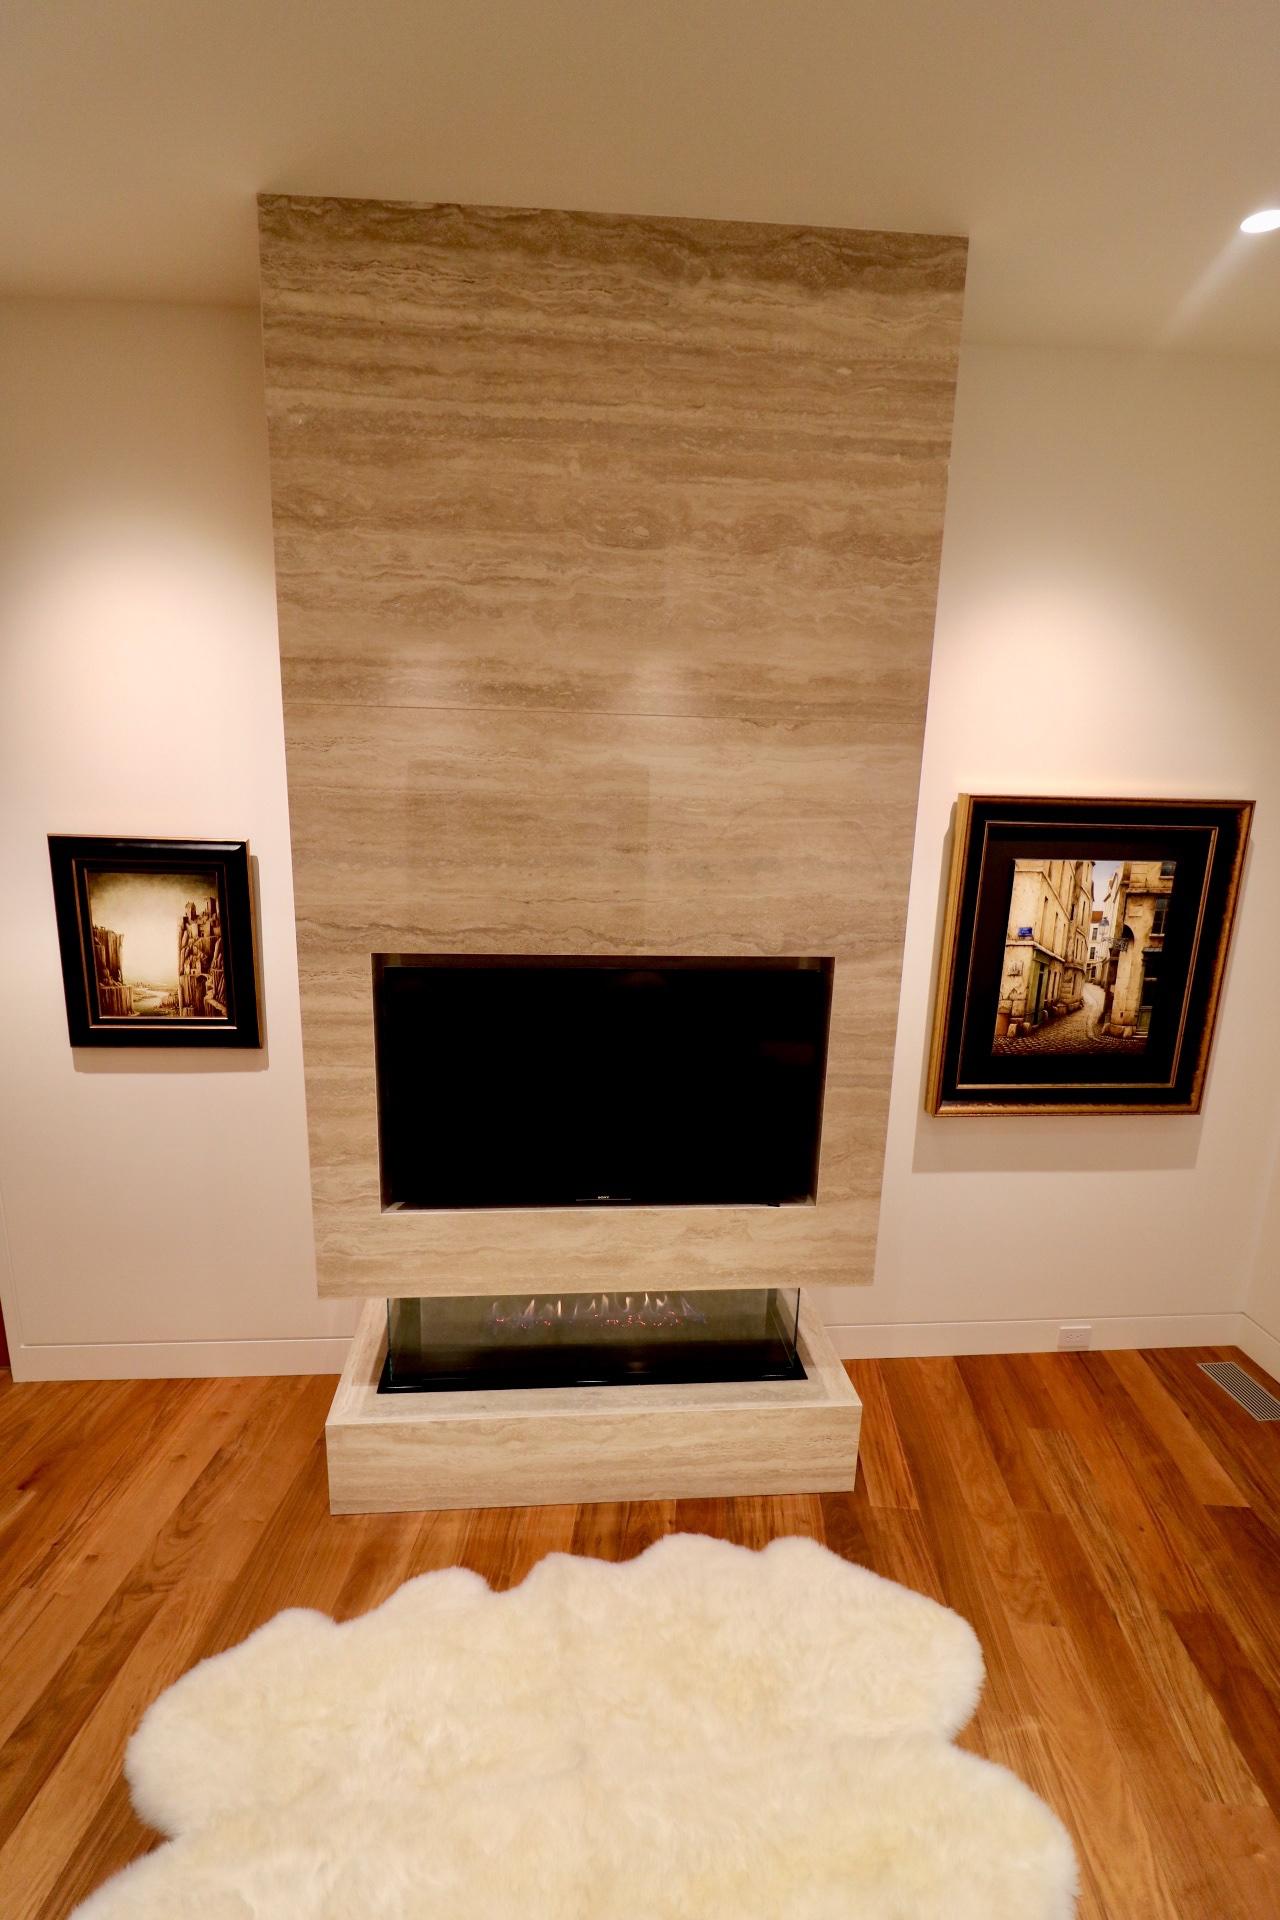 Metroworks Group Whistler Fireplace #2 10.JPG